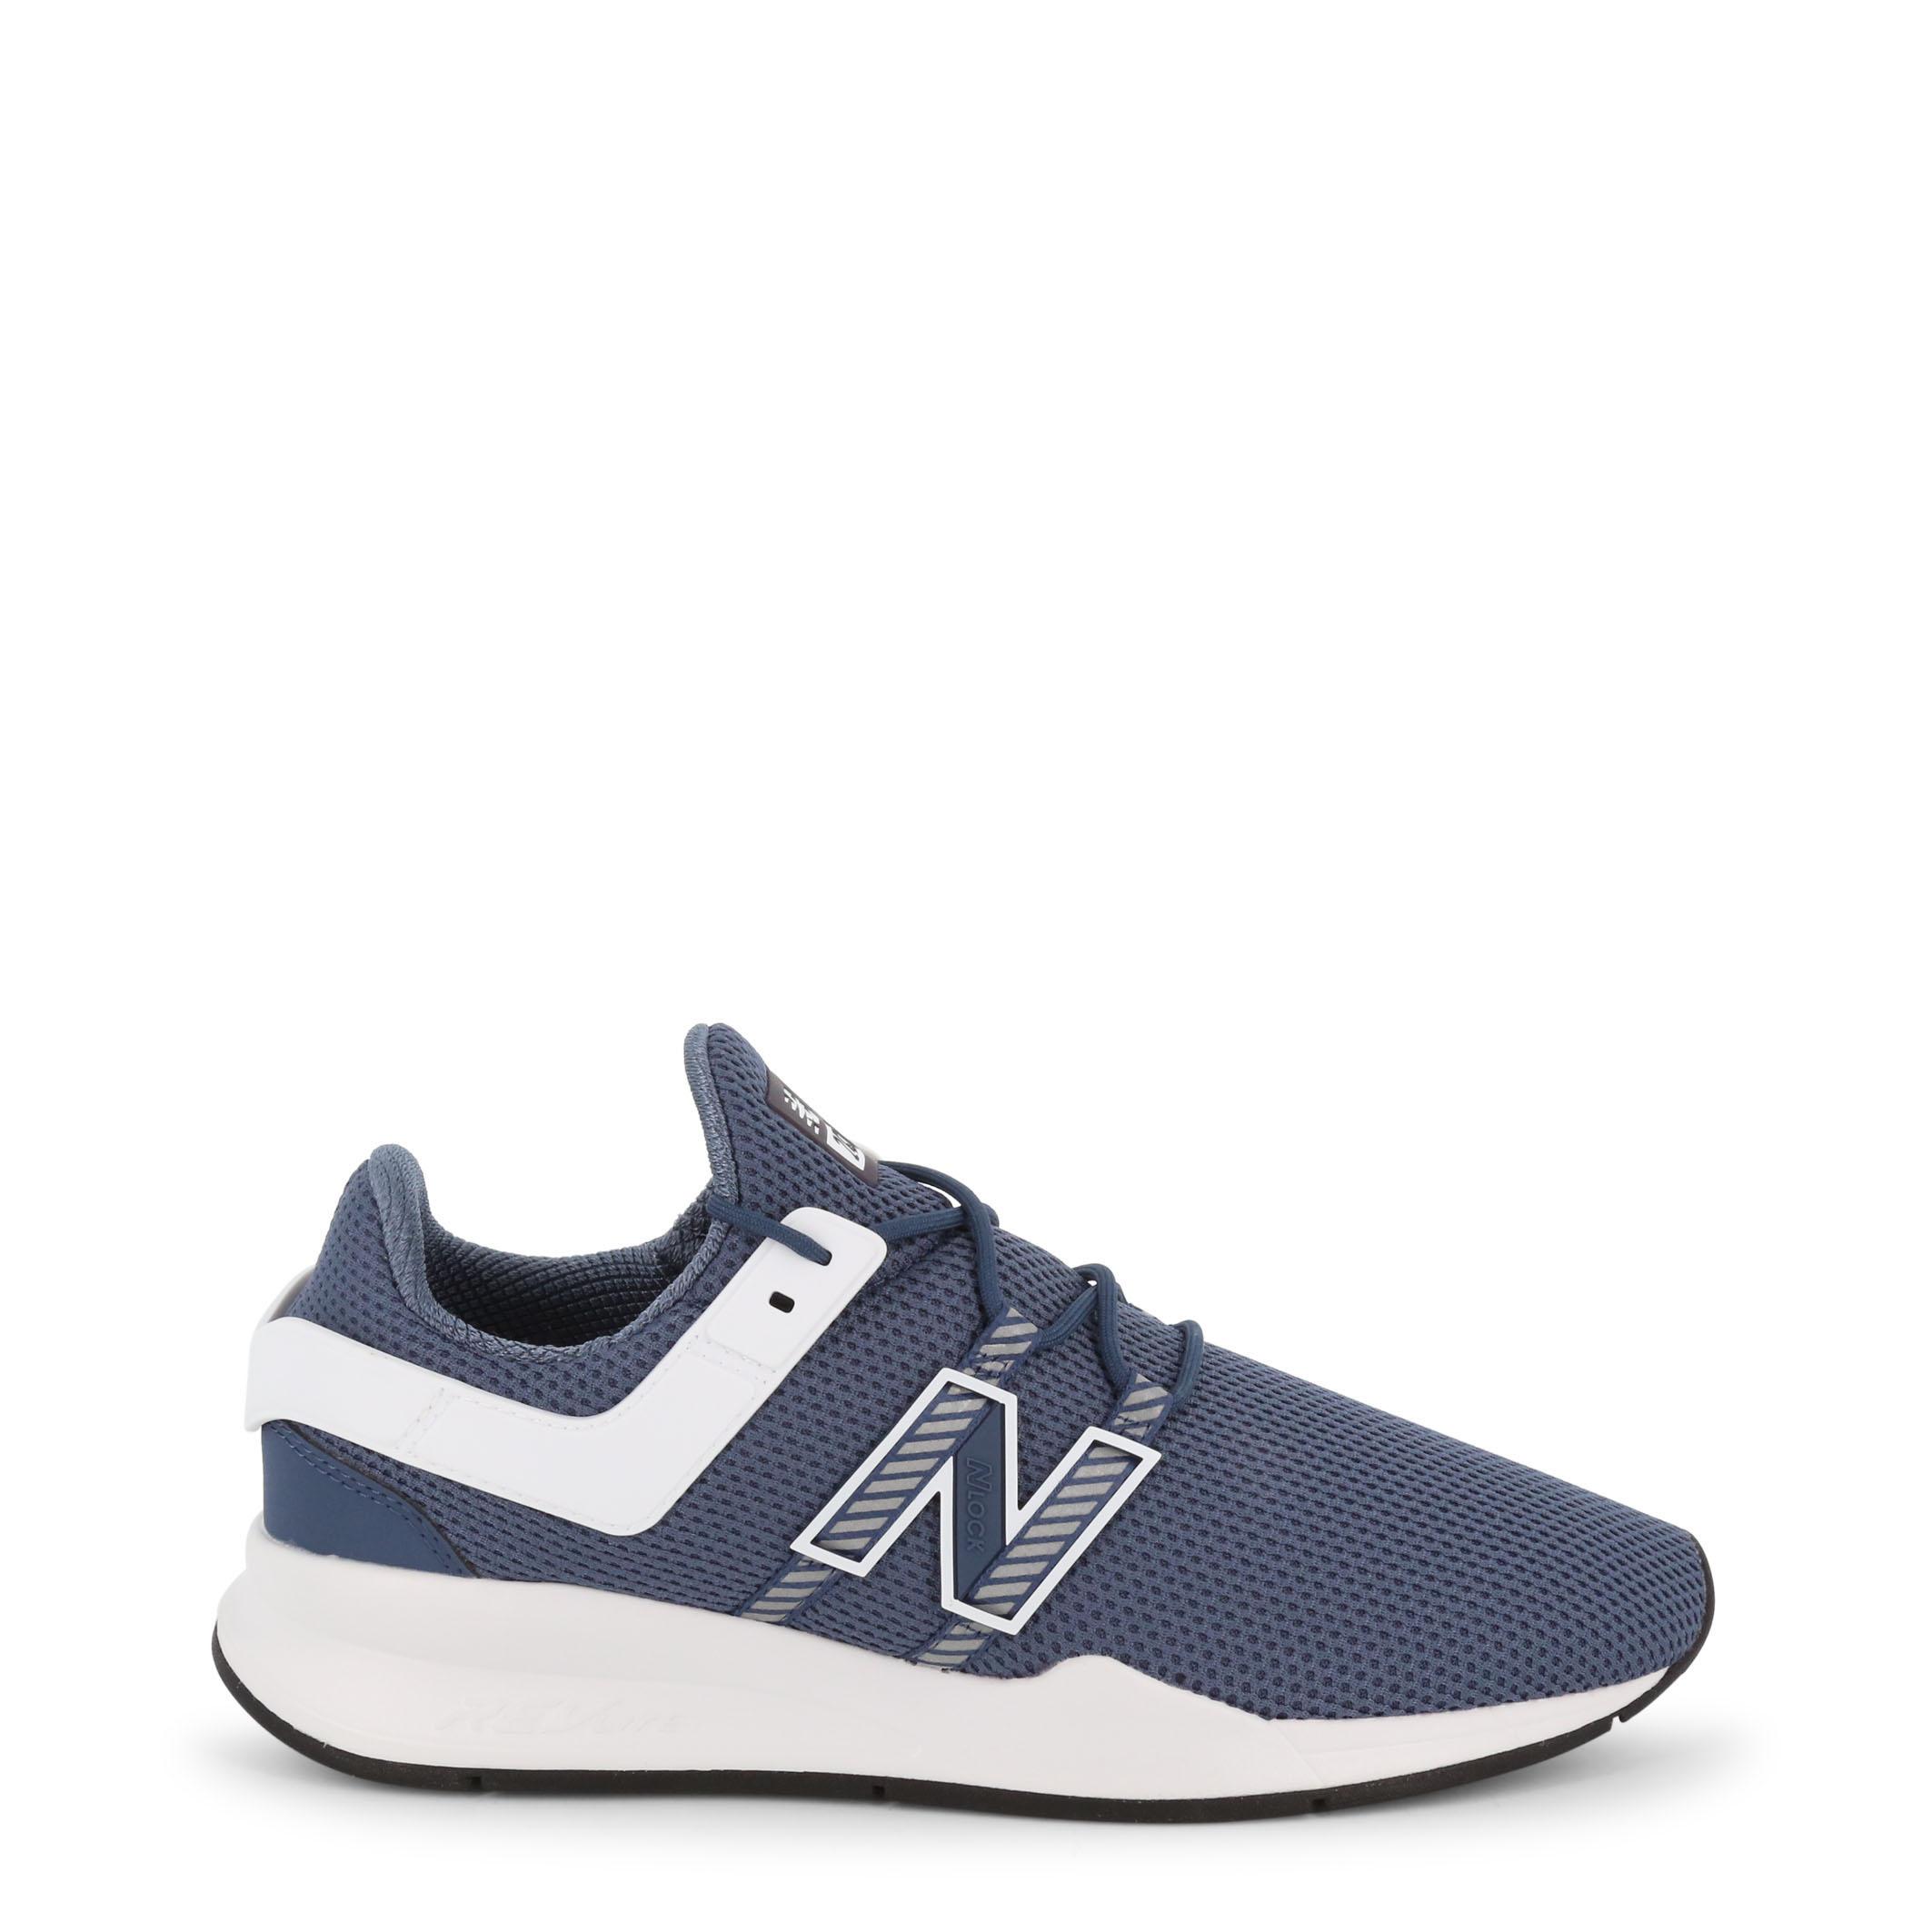 Scarpe New Balance Ms247 Uomo Blu 97892 Sneakers Sportive Traspiranti